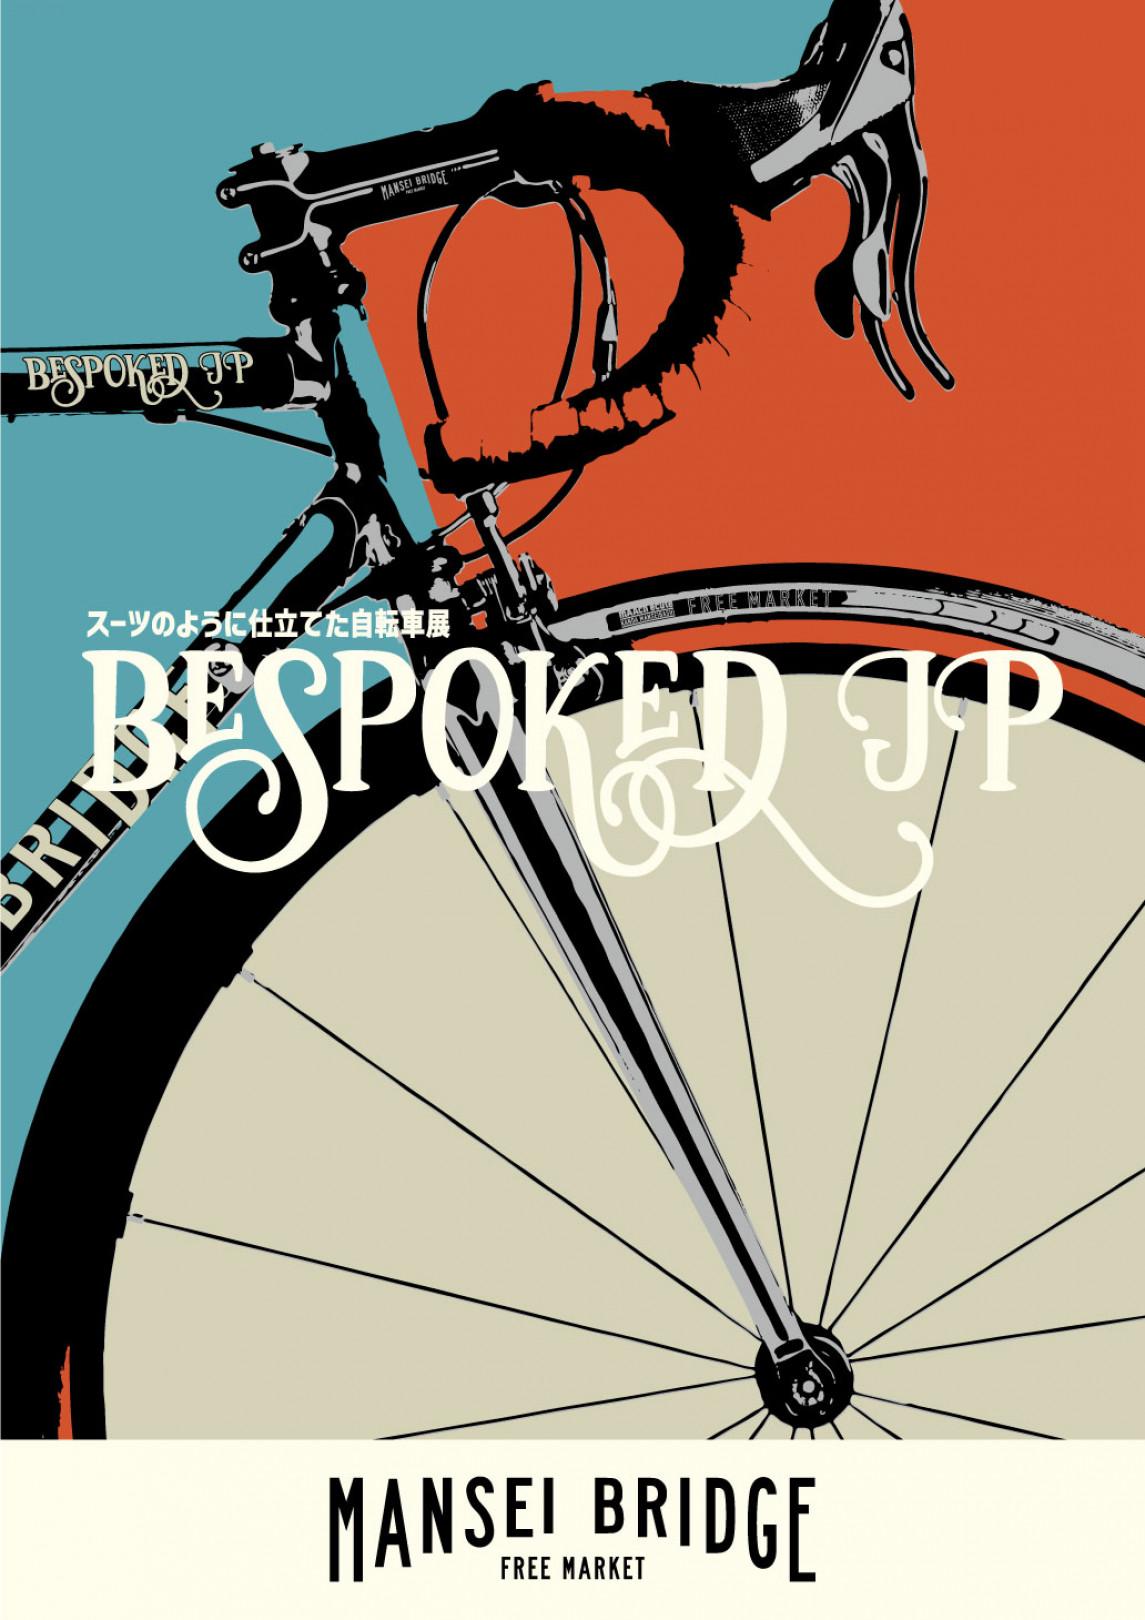 「MANSEI BRIDGE FREE MARKET」で、ハンドメイドバイクのイベント「BESPOKED JP -スーツのように仕立てた自転車展-」が5月5日から2日間開催